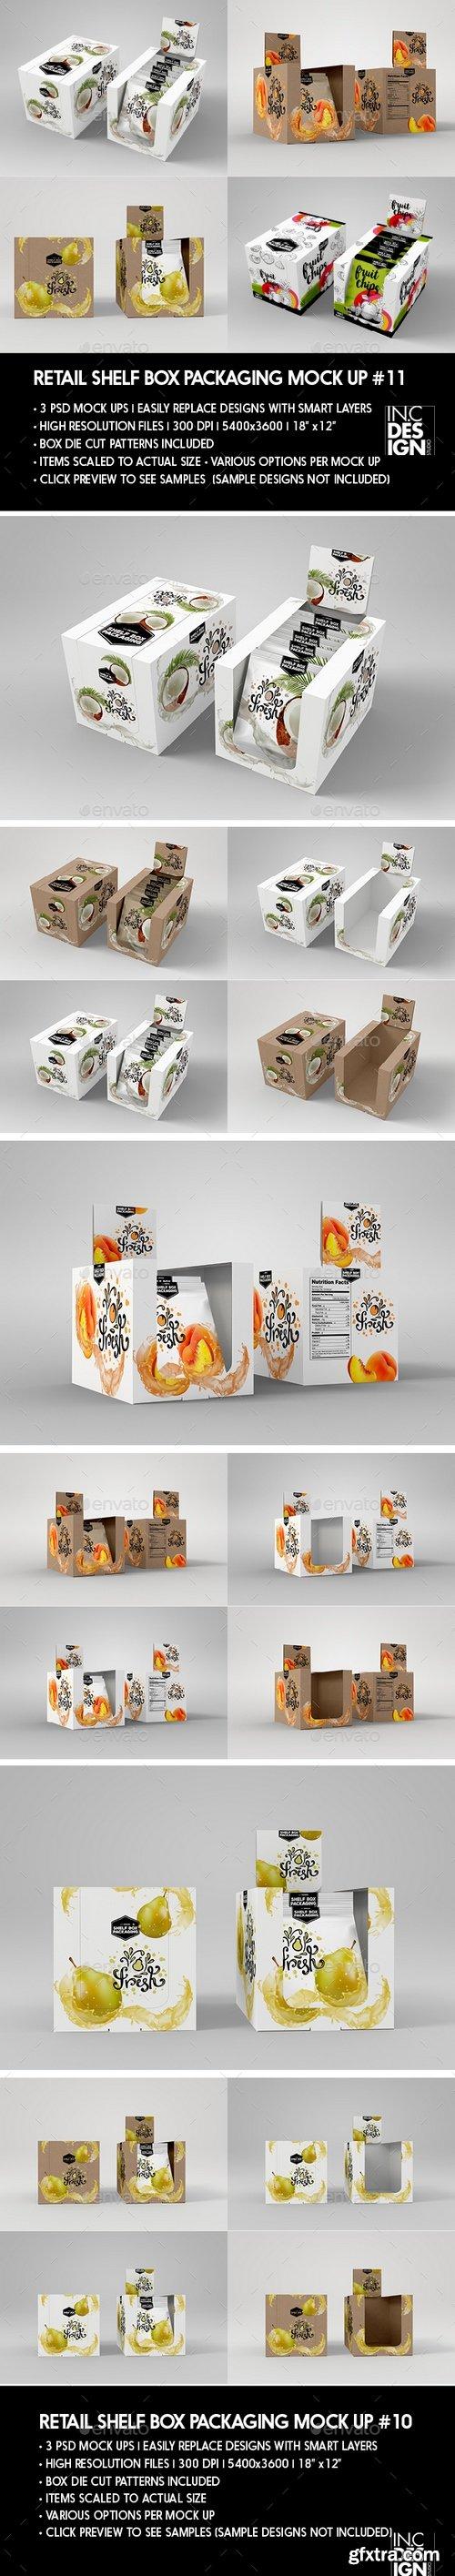 Graphicriver - Retail Shelf Box Packaging MockUp No.11 20536122